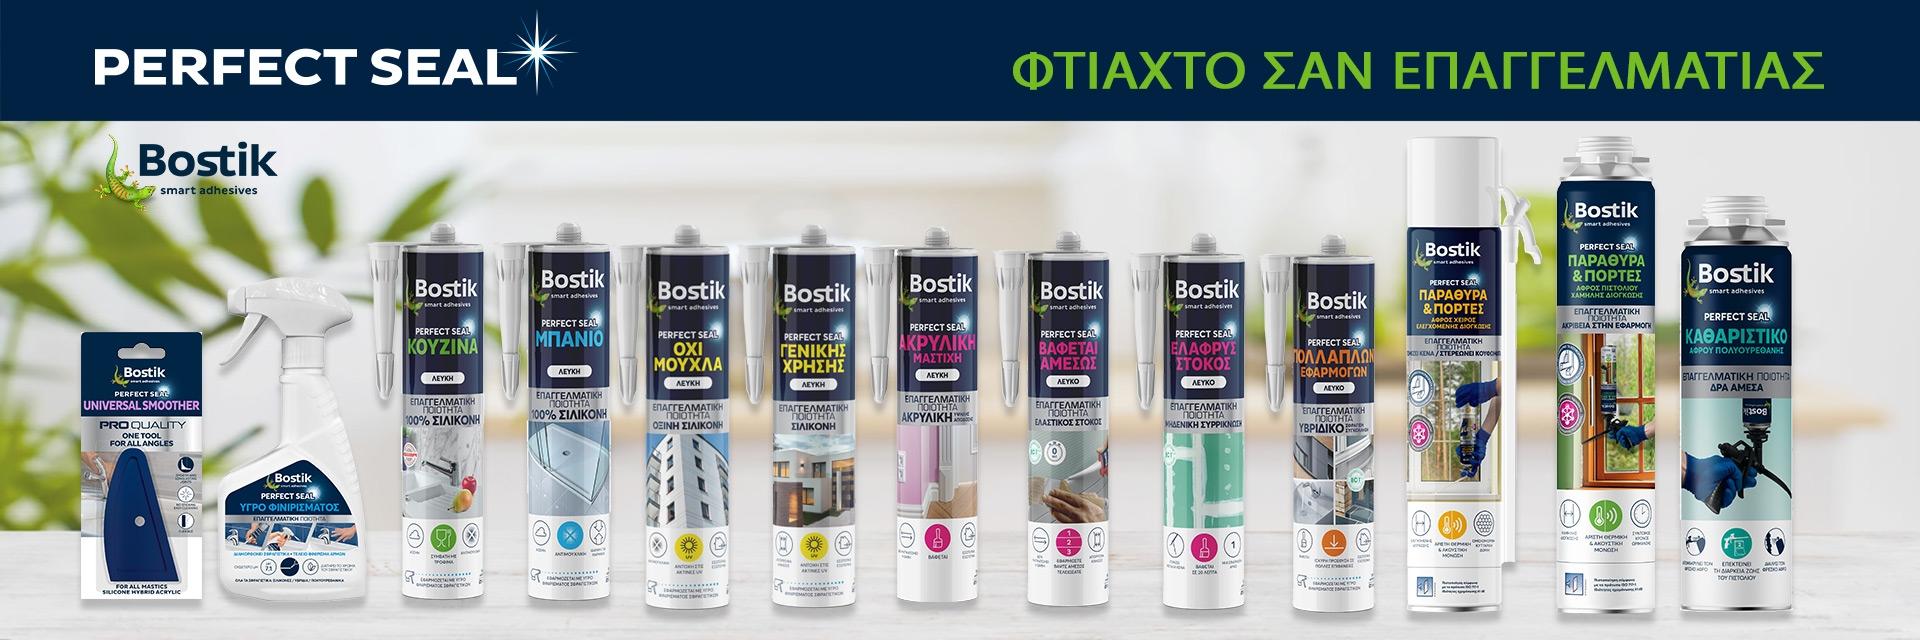 Bostik DIY Greece Perfect Seal range banner 1920x640